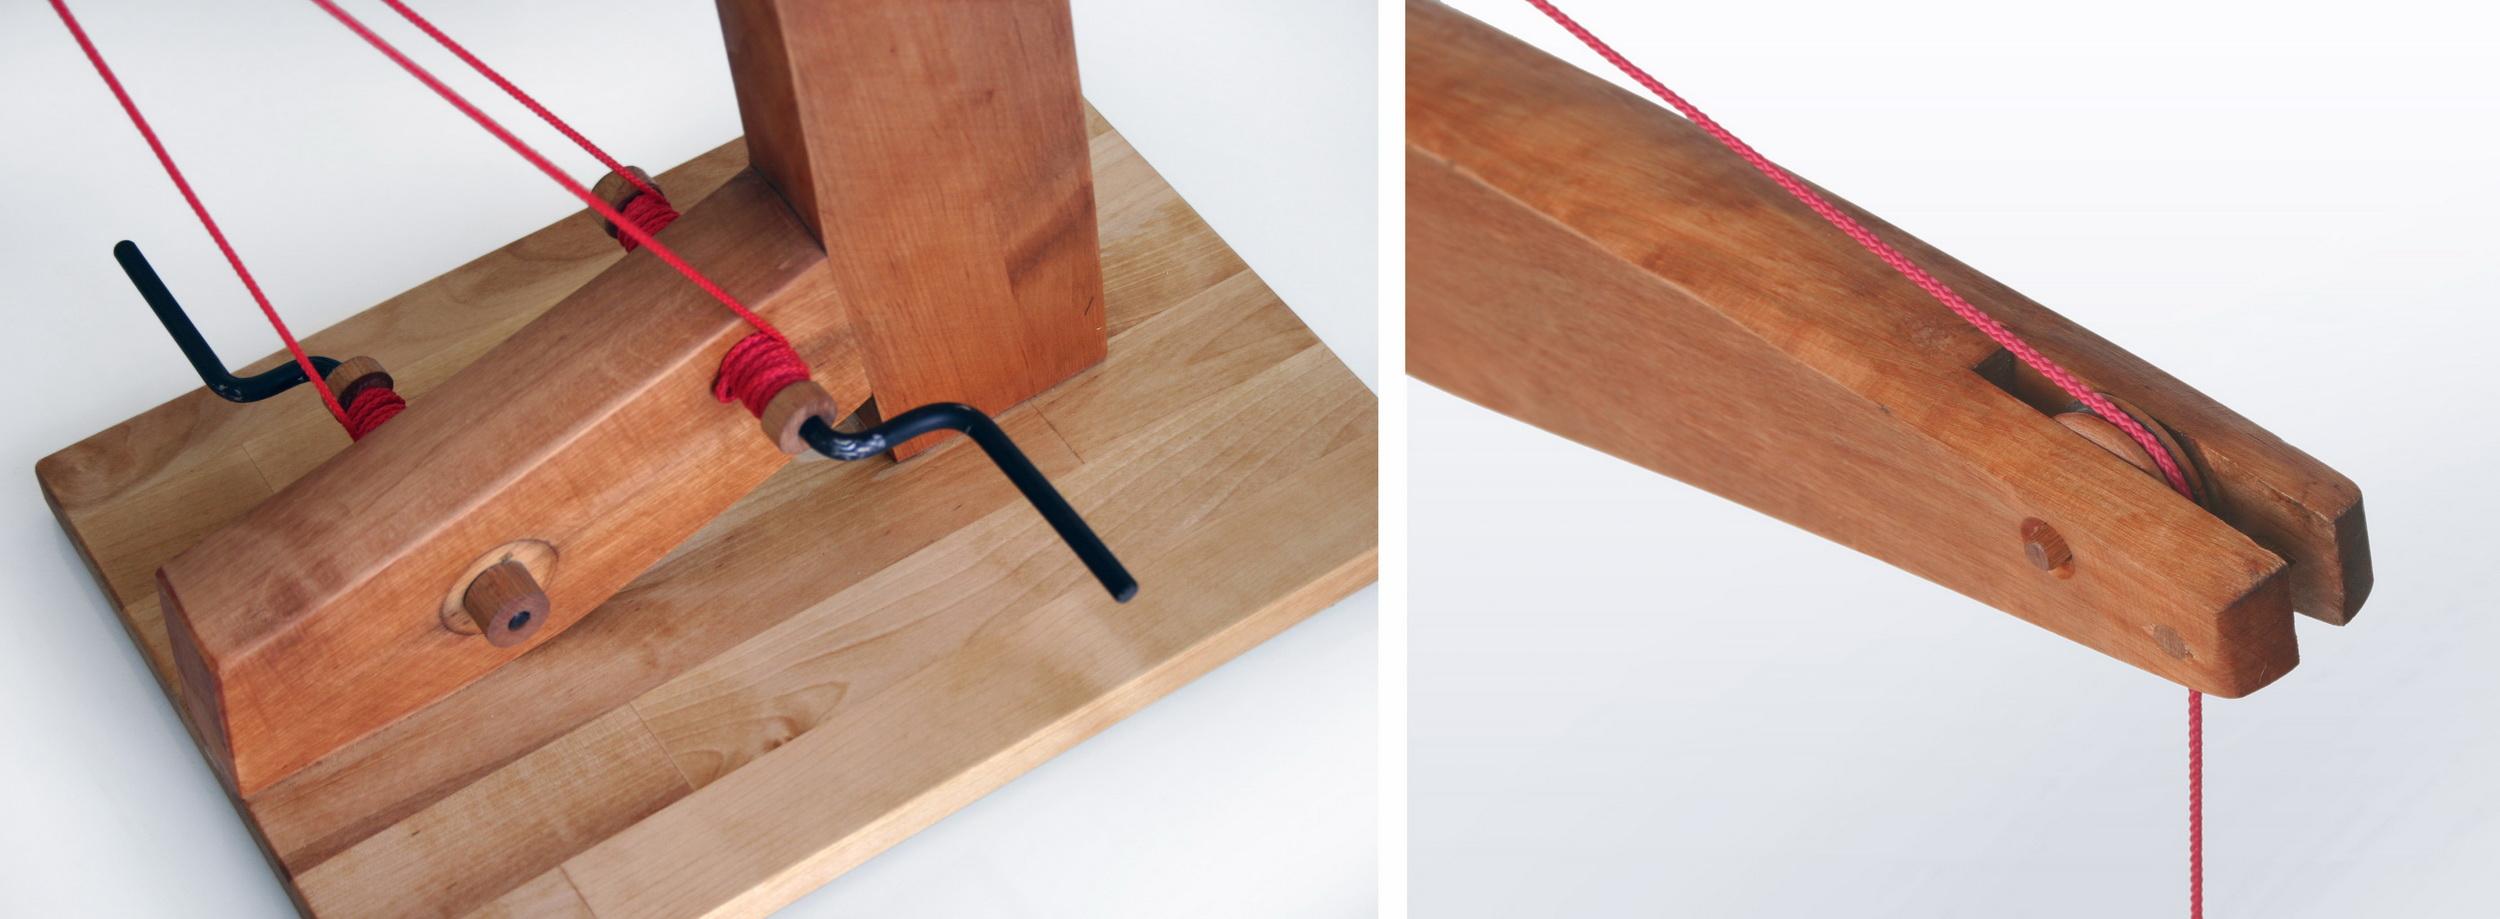 recycling produkte seite 3 nebenprodukte. Black Bedroom Furniture Sets. Home Design Ideas